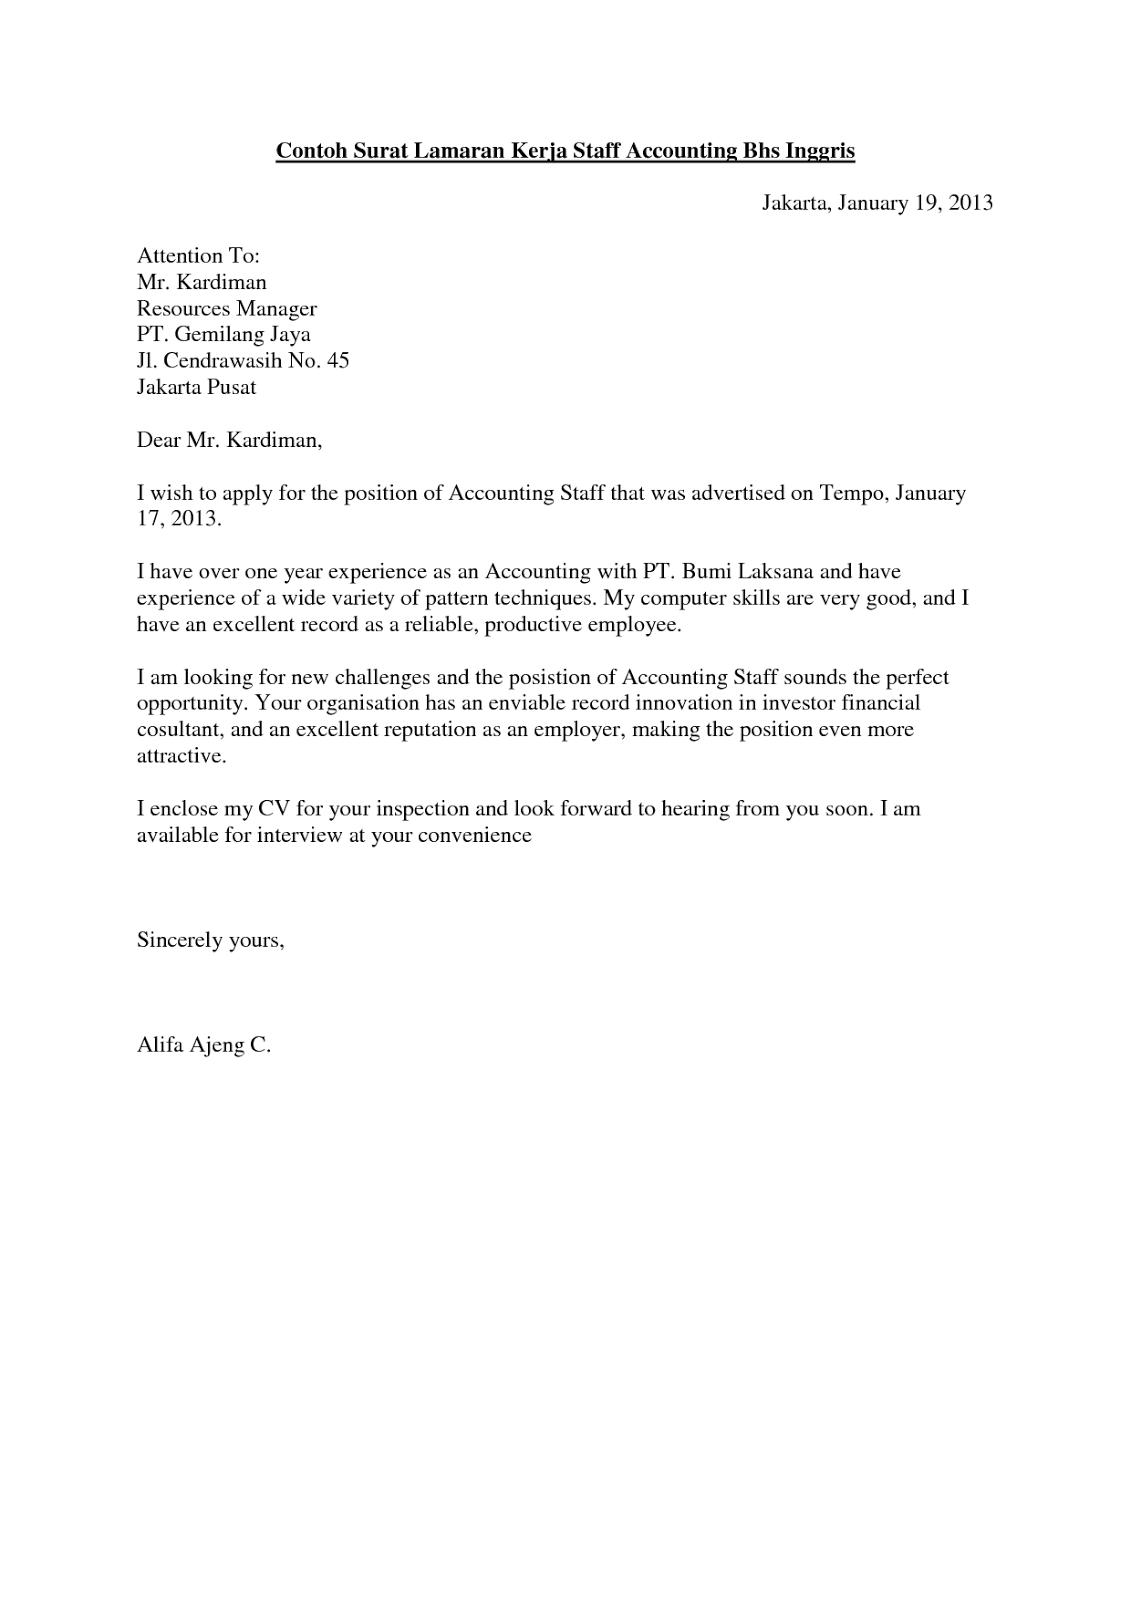 Surat Lamaran Kerja Bahasa Inggris Penjelasan Contoh Contoh Surat Lamaran Kerja Bahasa Inggris Fresh Graduate